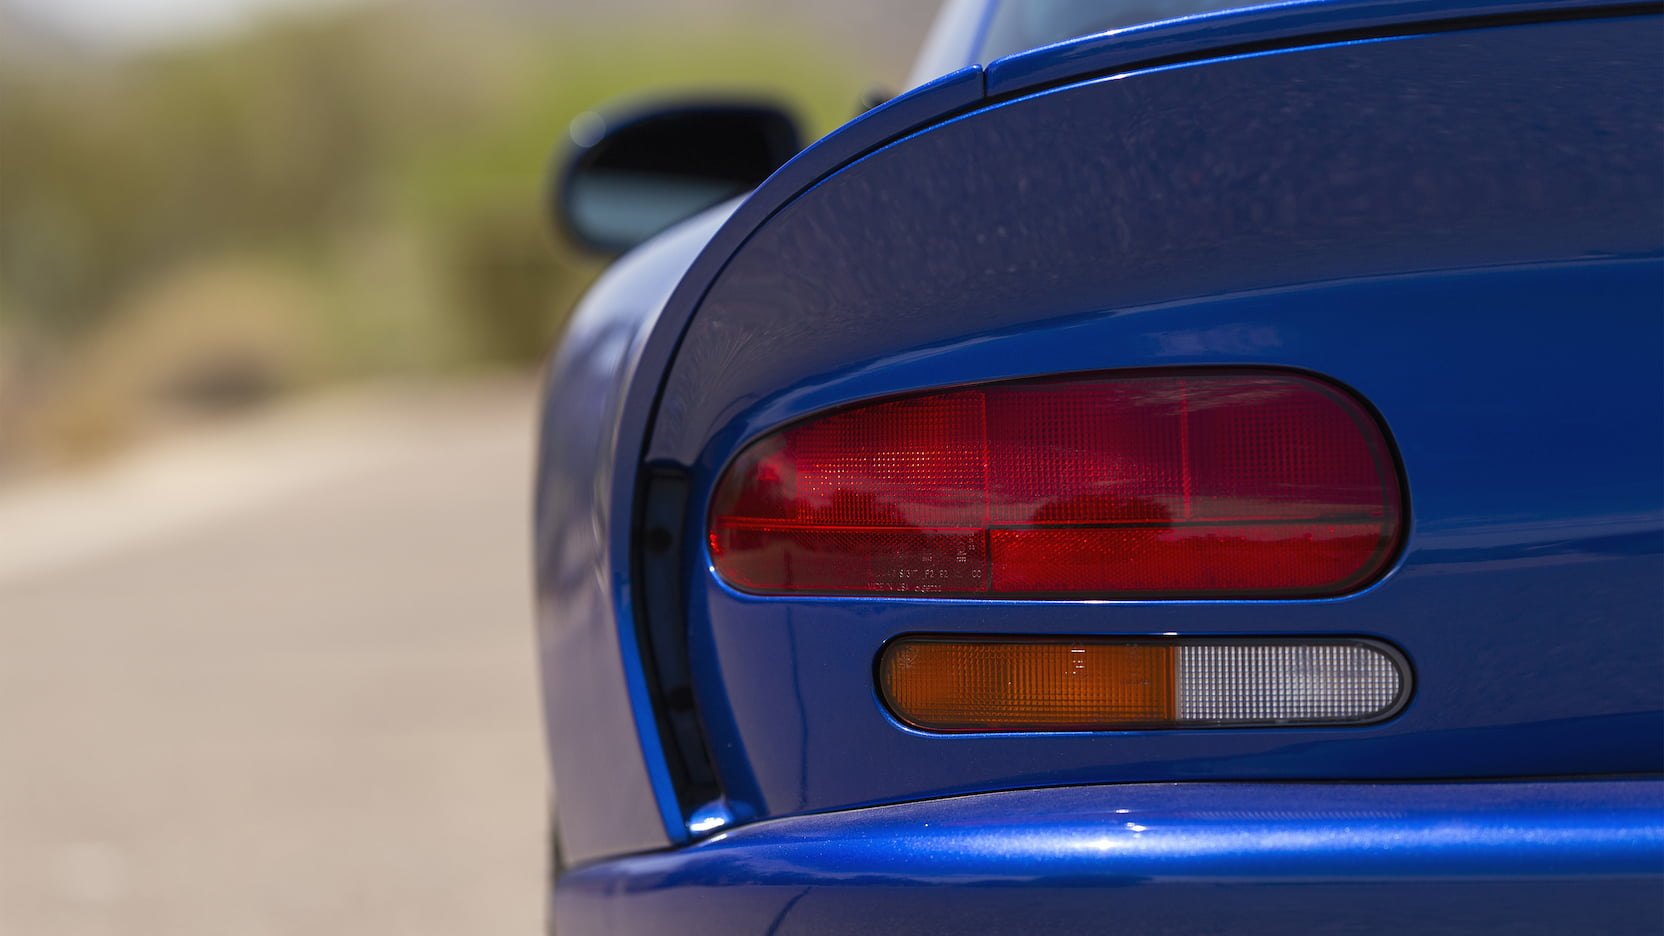 1996 Dodge Viper GTS taillight detail